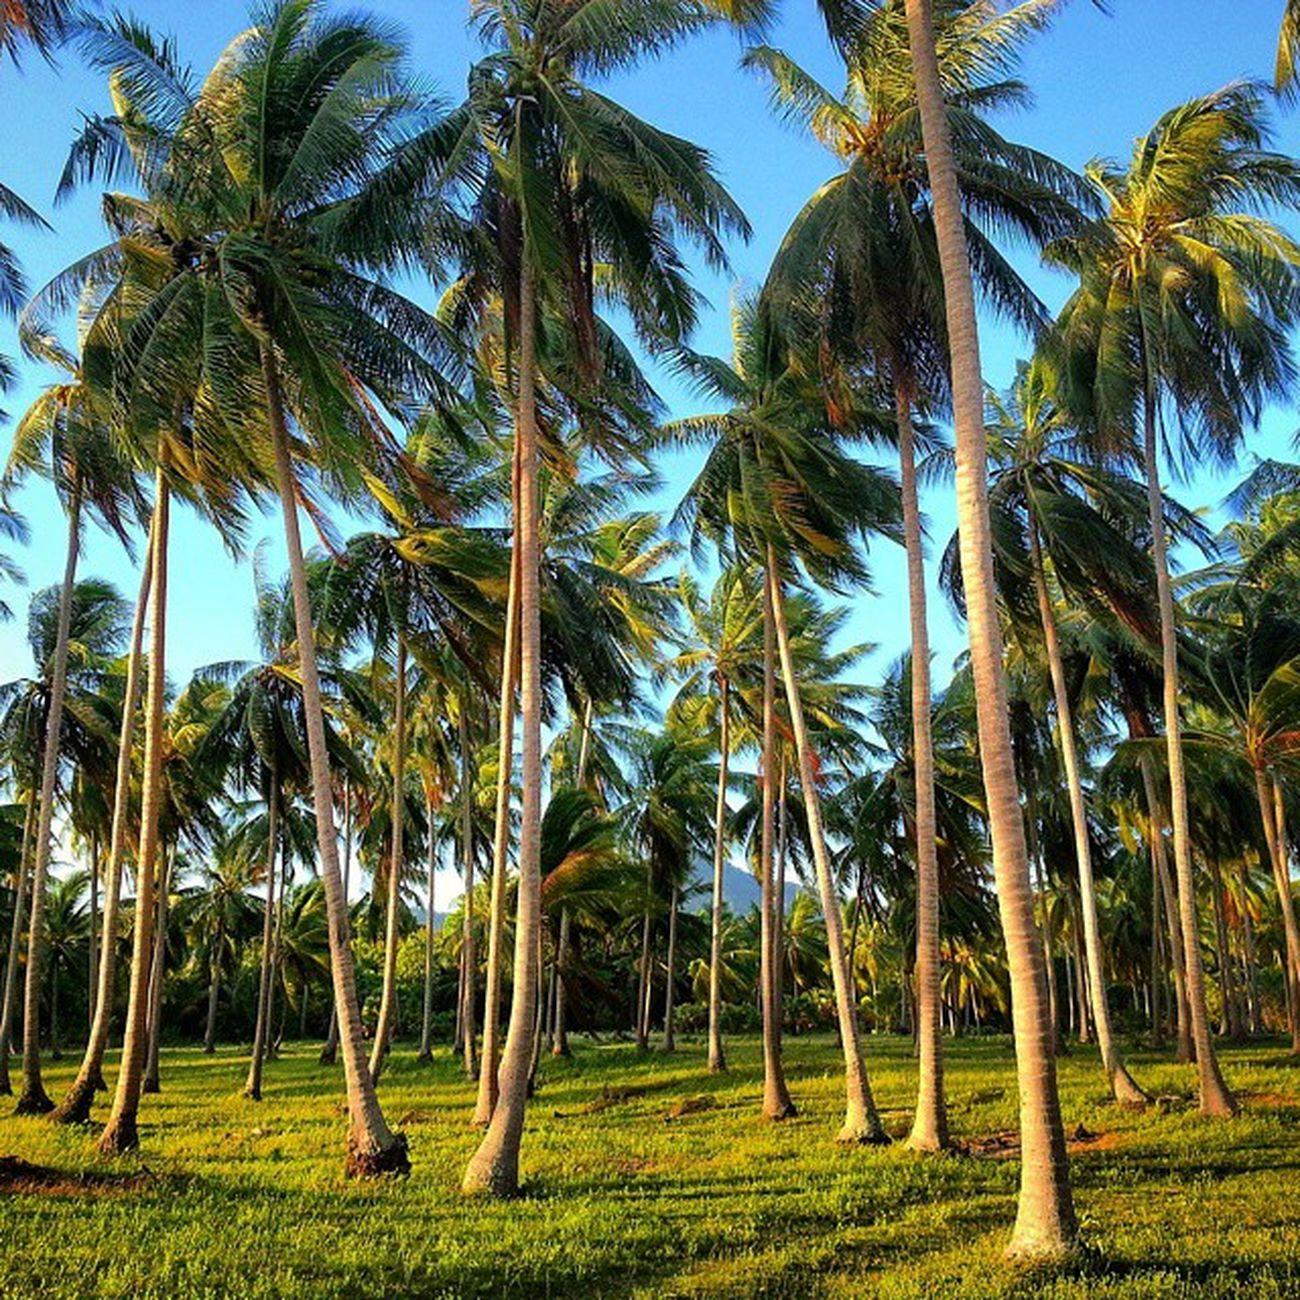 Island Vacation Nature Lalaland picoftheday instagram nofilter palmtree